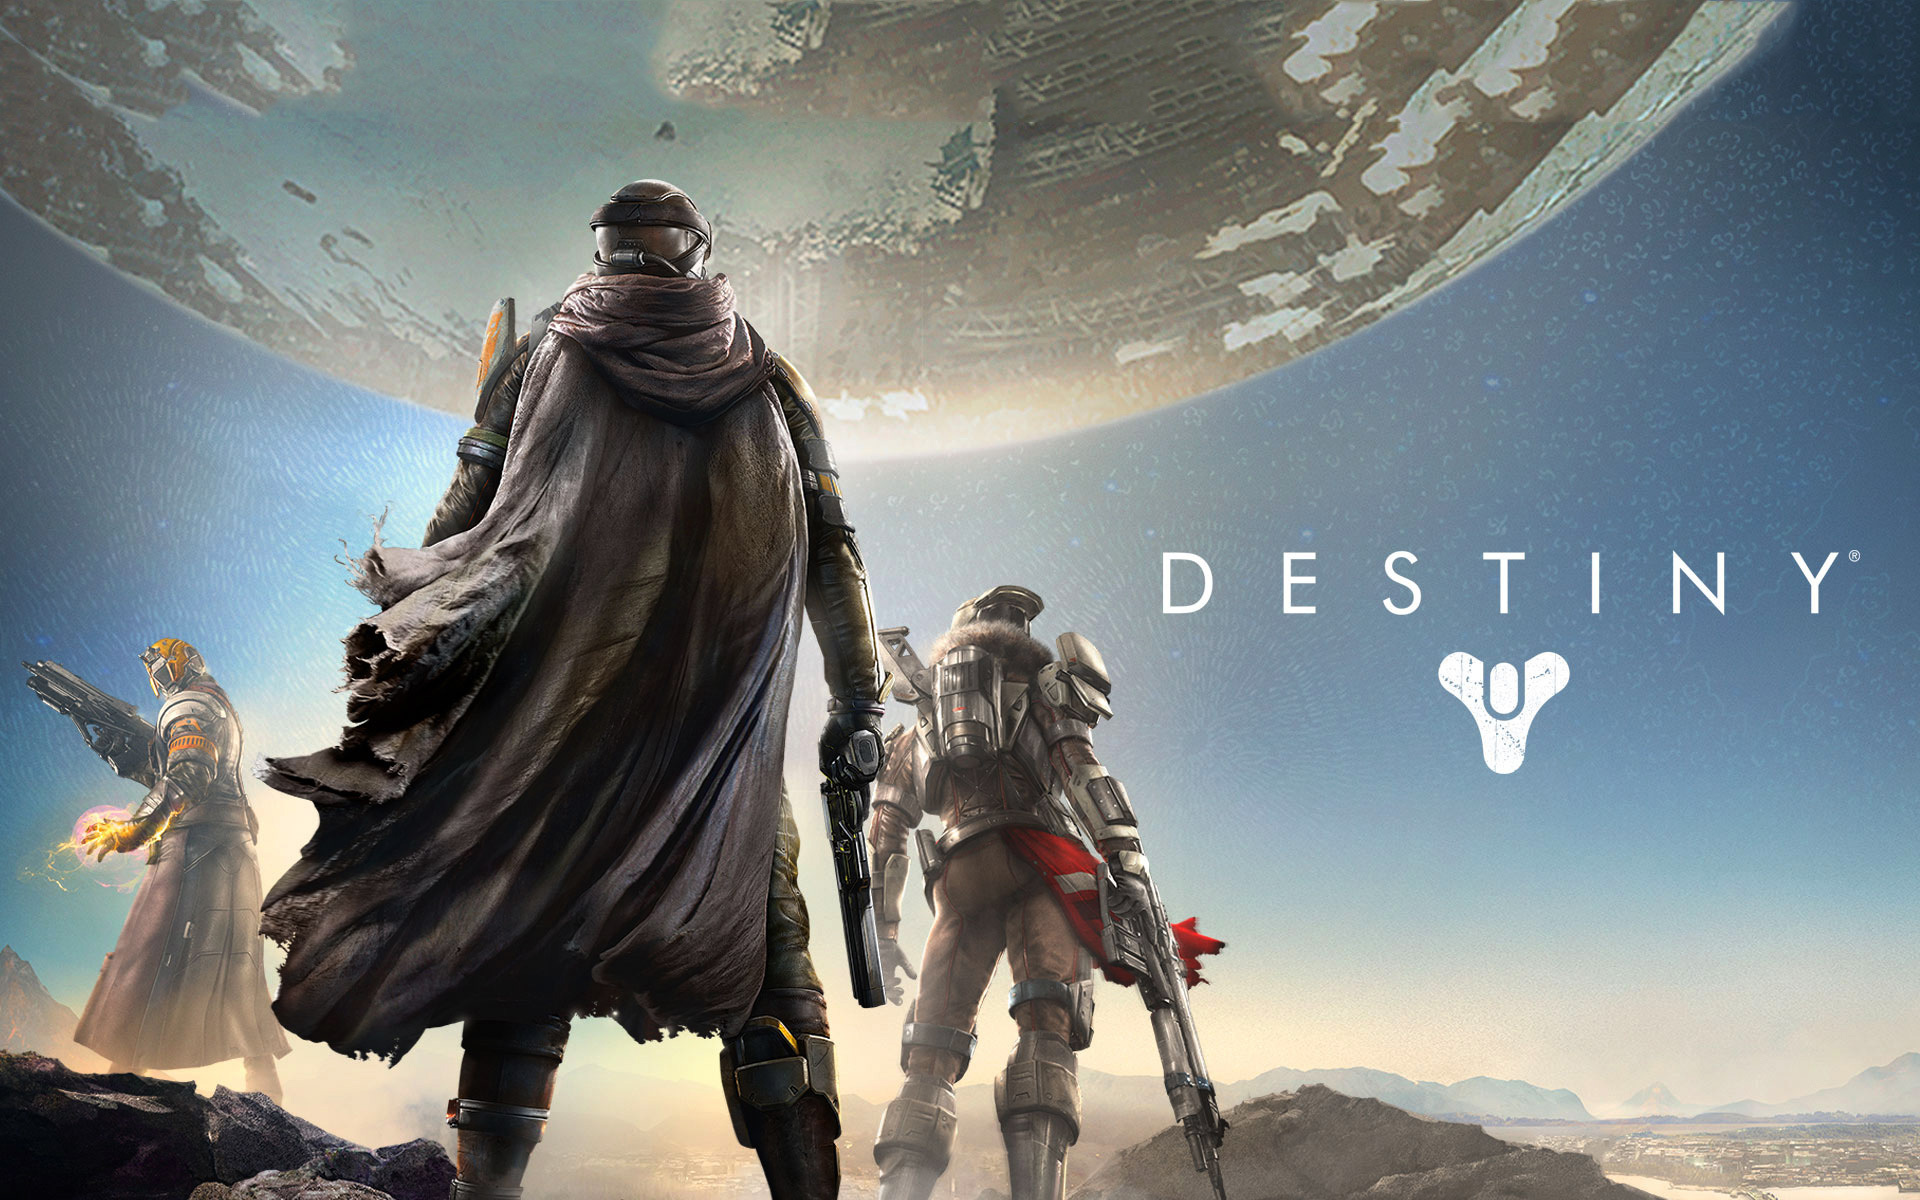 General 1920x1200 destiny Destiny 2  Destiny (video game) video games science fiction magician hunter (destiny) Titan (Destiny) armor futuristic armor